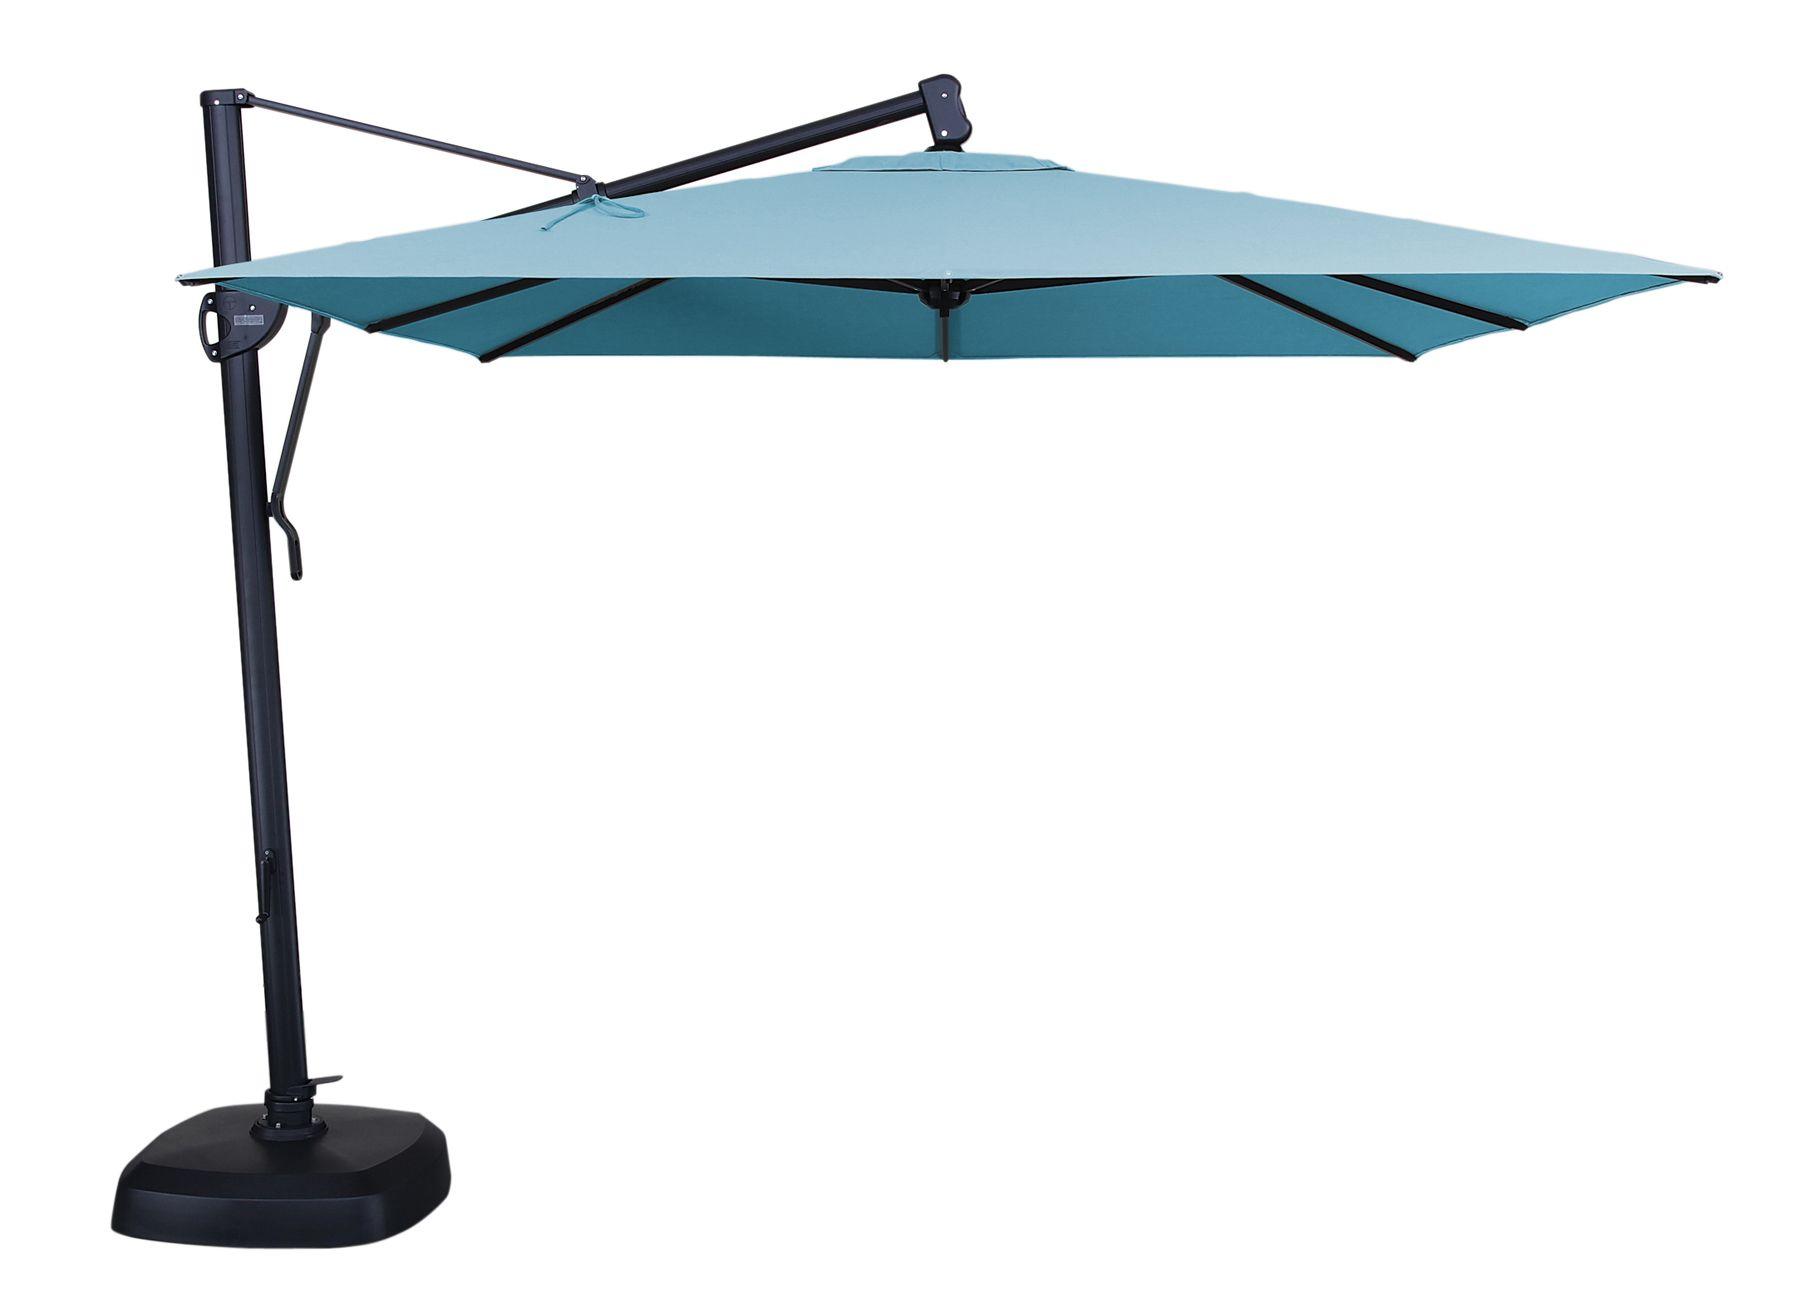 Akzsq 10 Cantilever Umbrella By Treasure Garden Cantilever Patio Umbrella Patio Umbrella Patio